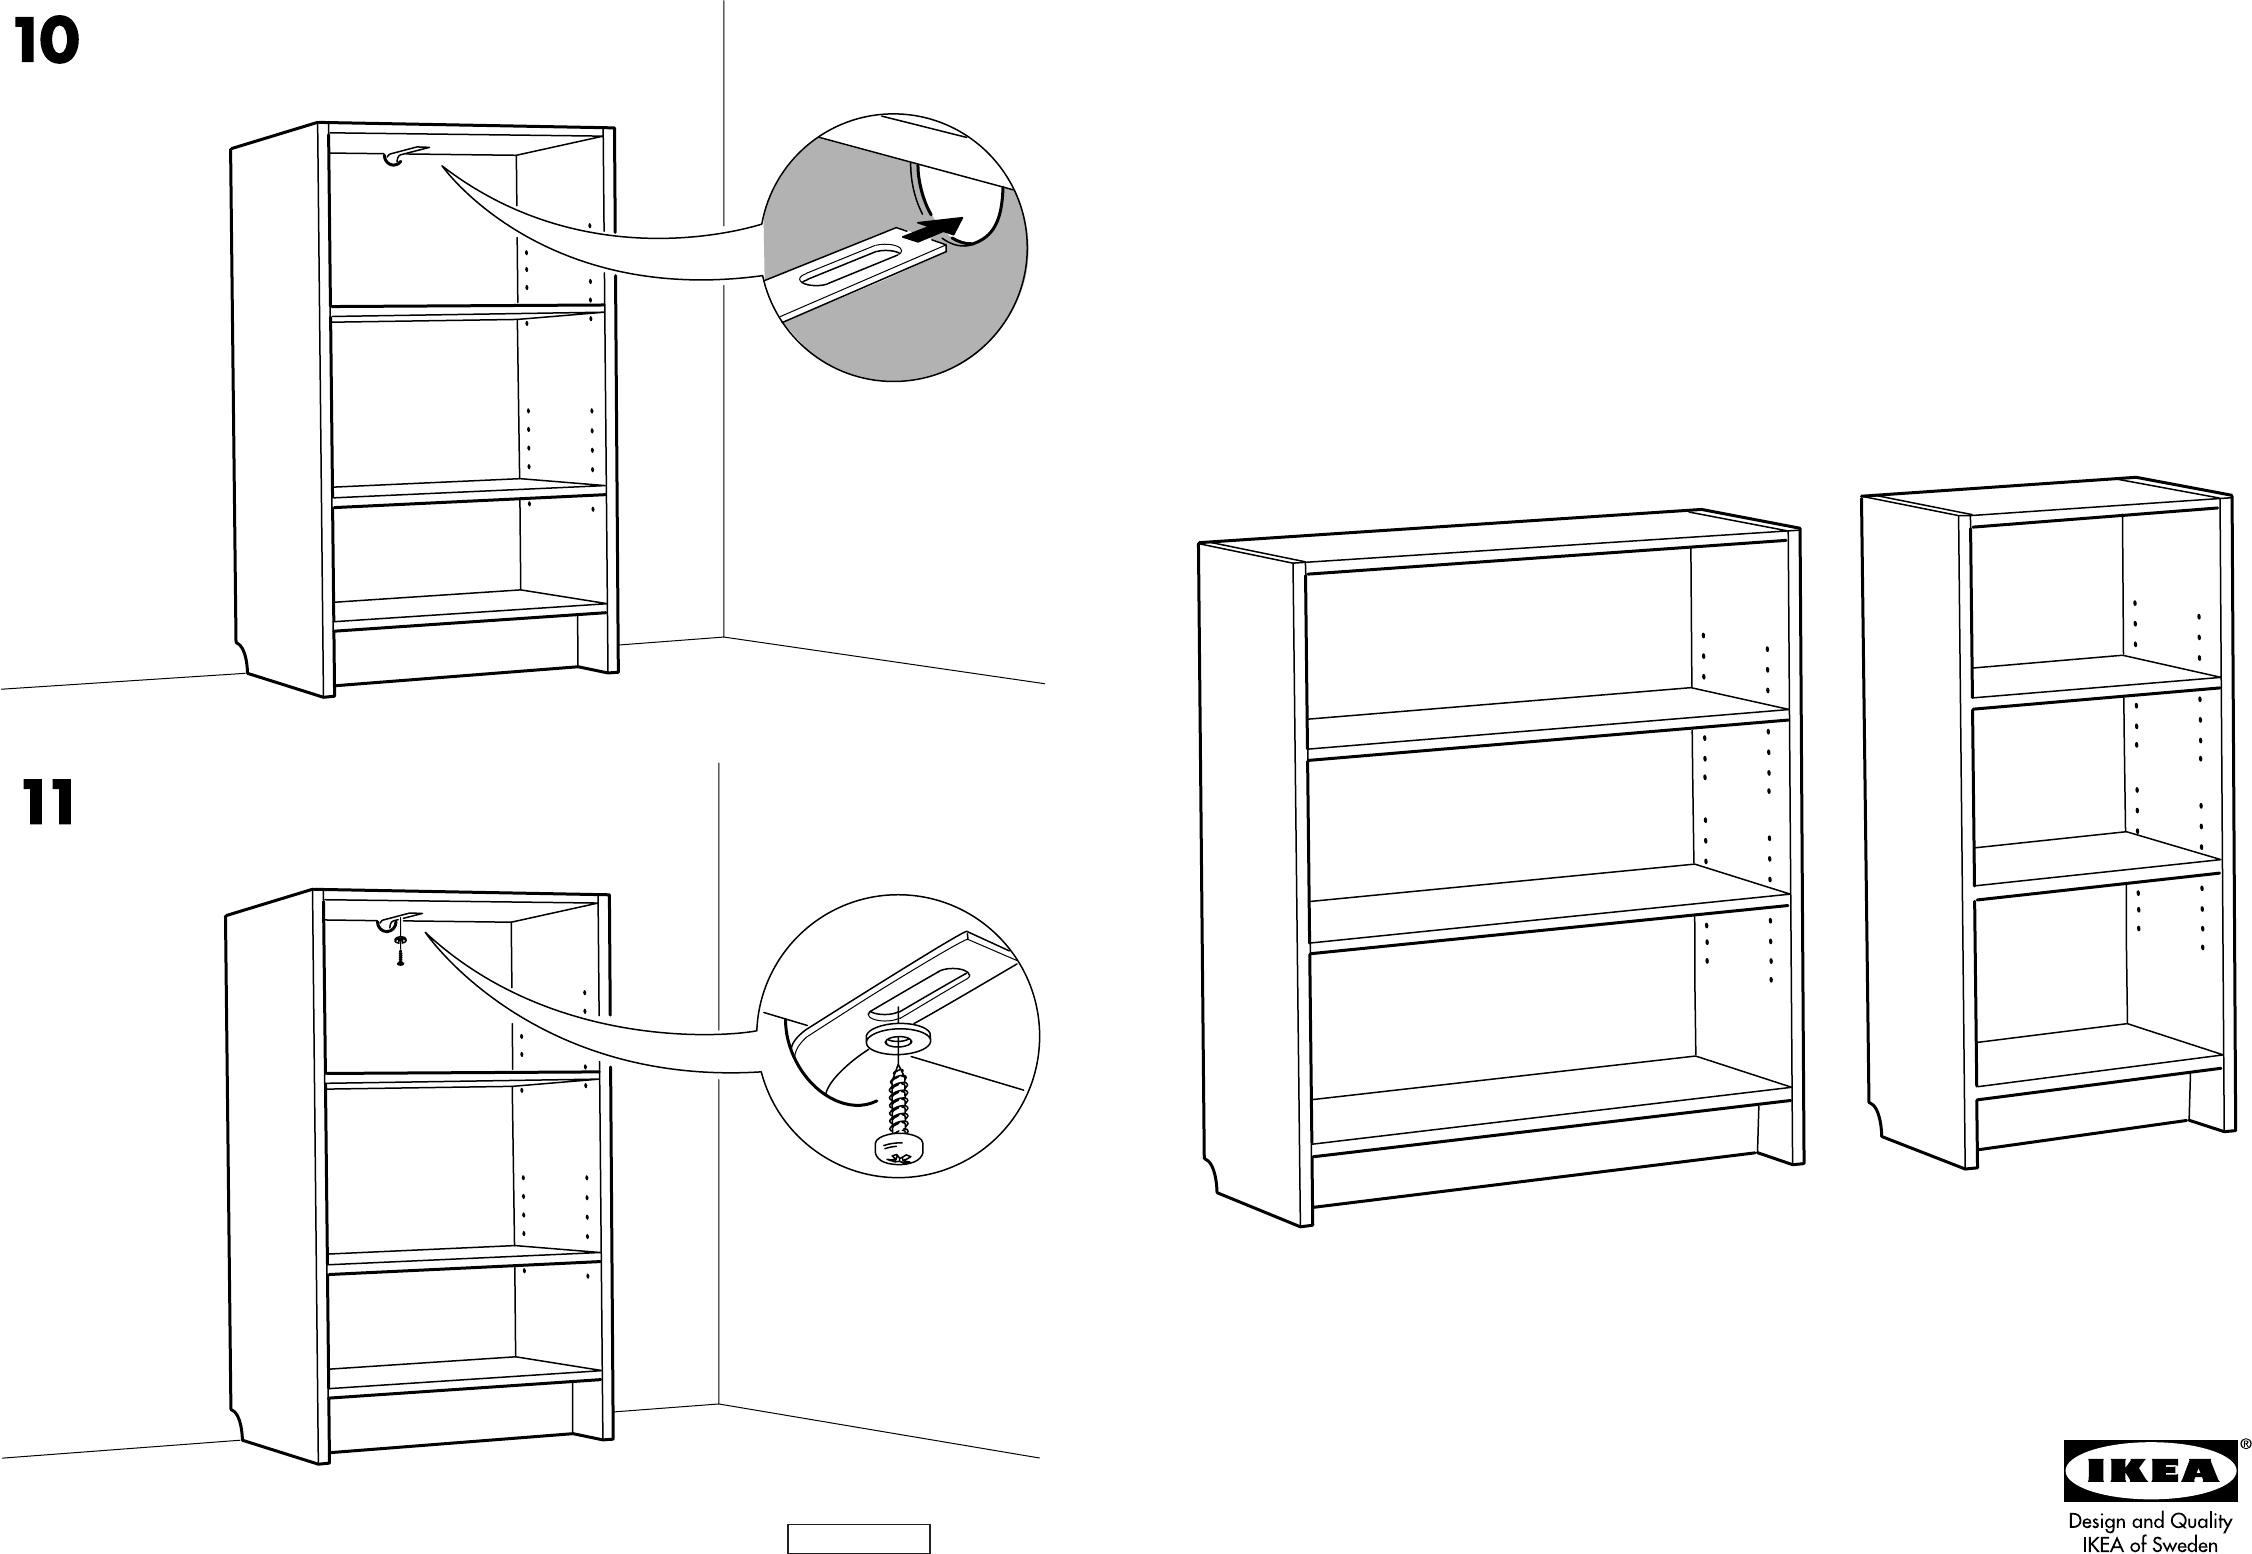 Handleiding Ikea Billy boekenkast (pagina 1 van 4) (Dansk, Deutsch, English, Espan u00f4l, Fran u00e7ais